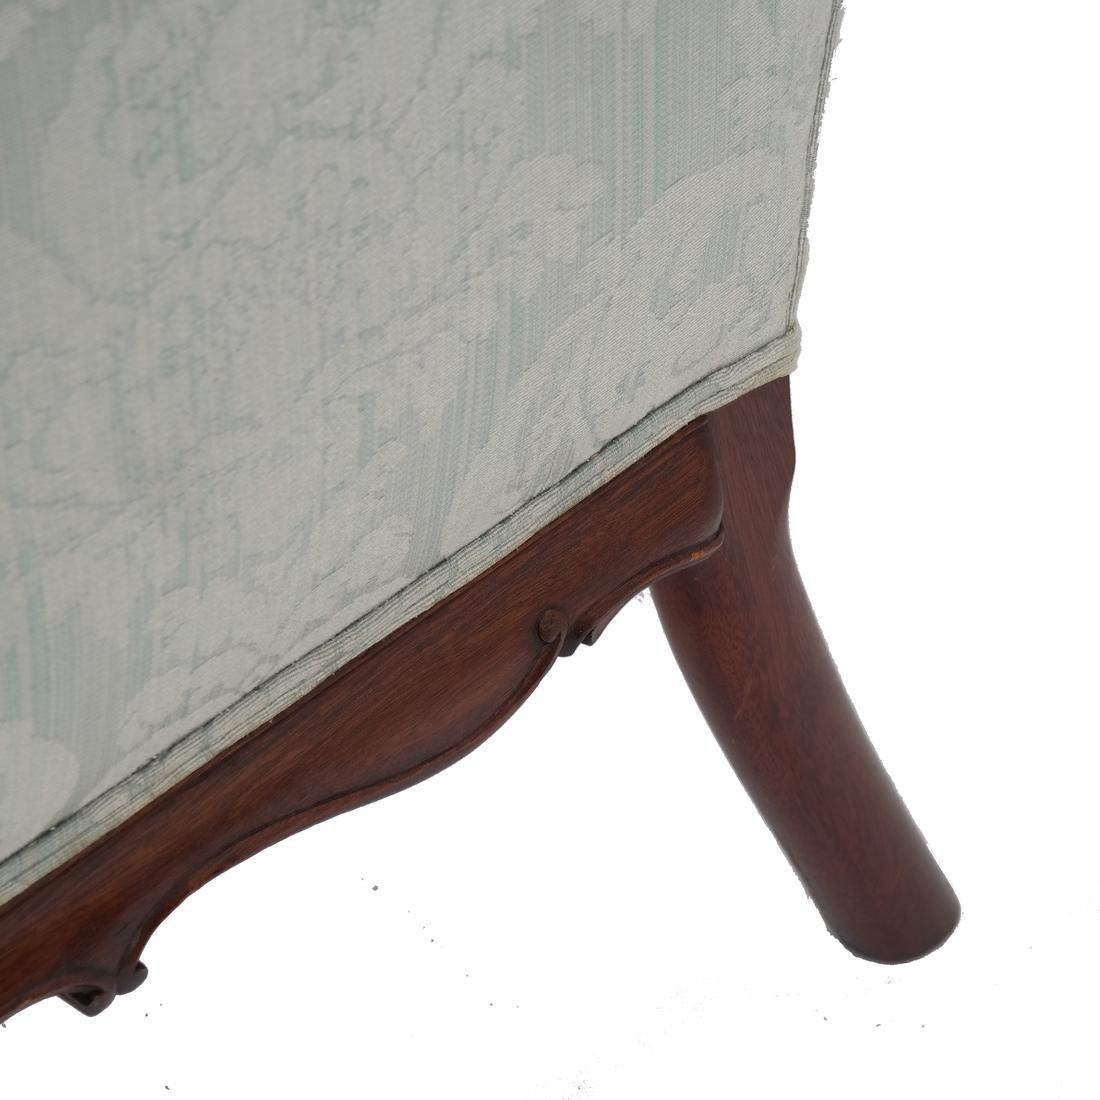 Irish Ball & Claw Wing Chair 19th Century - 7